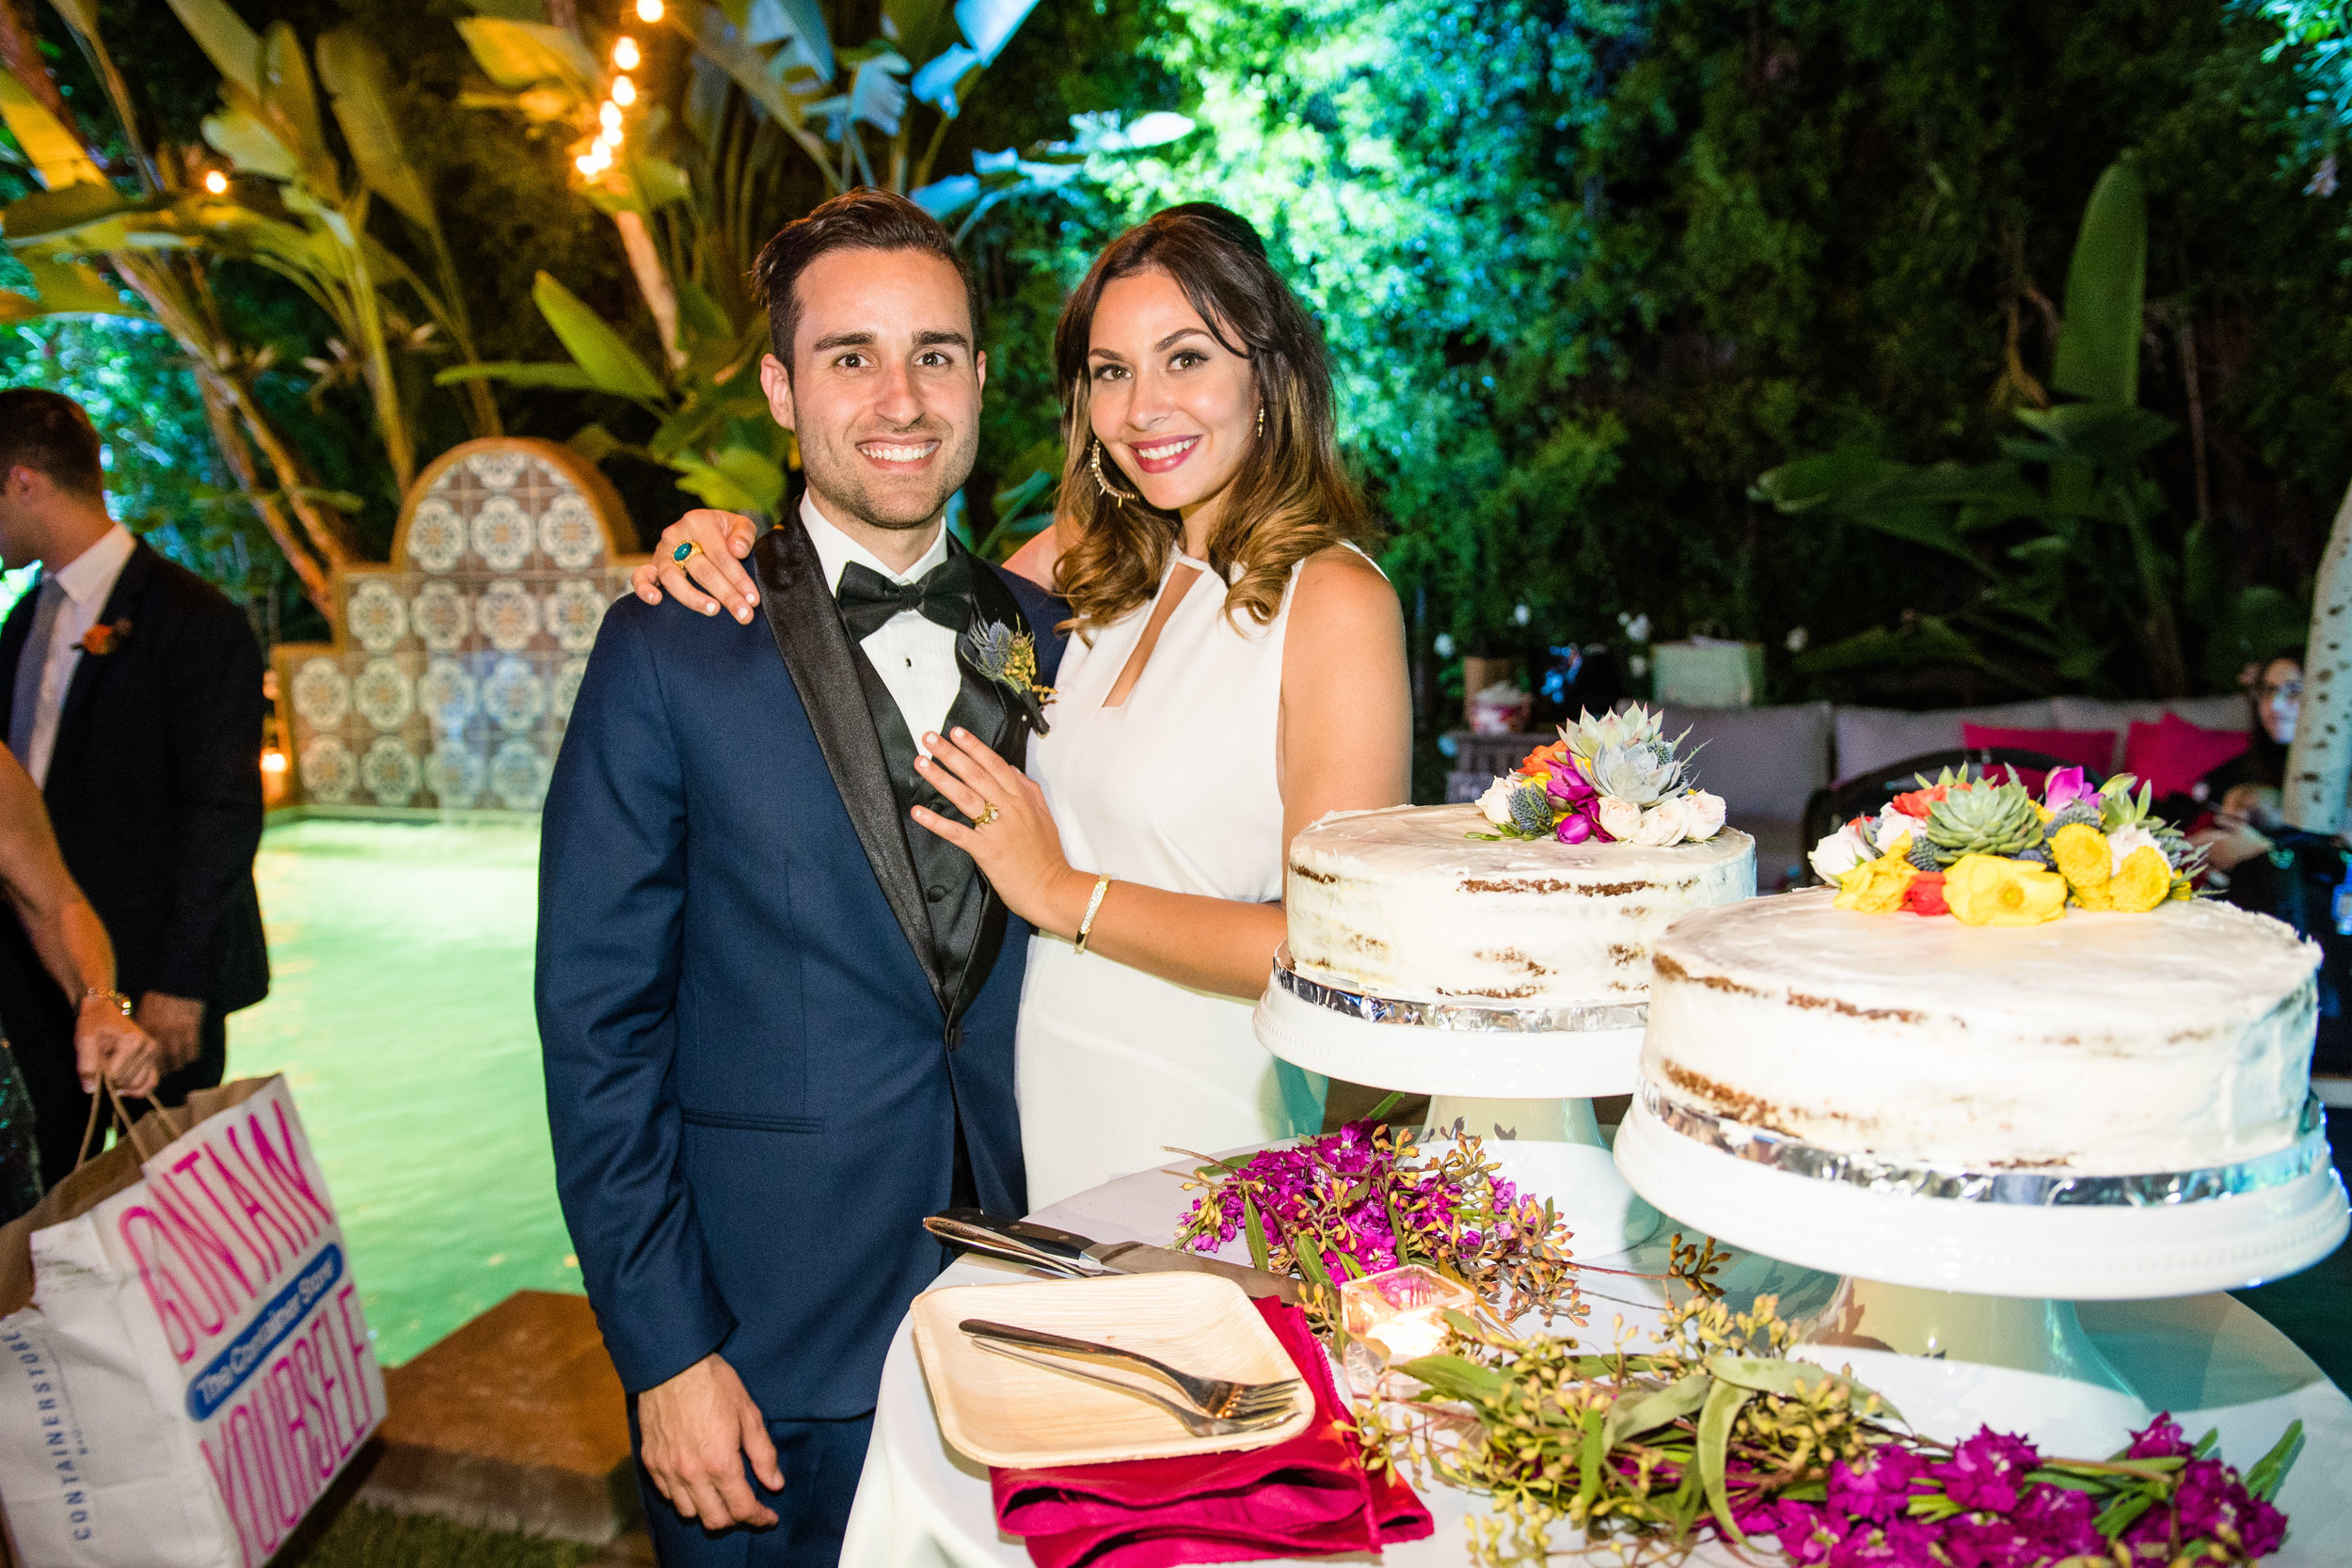 Vibrant Fiesta Backyard Wedding Reception bride and groom with cake.jpg